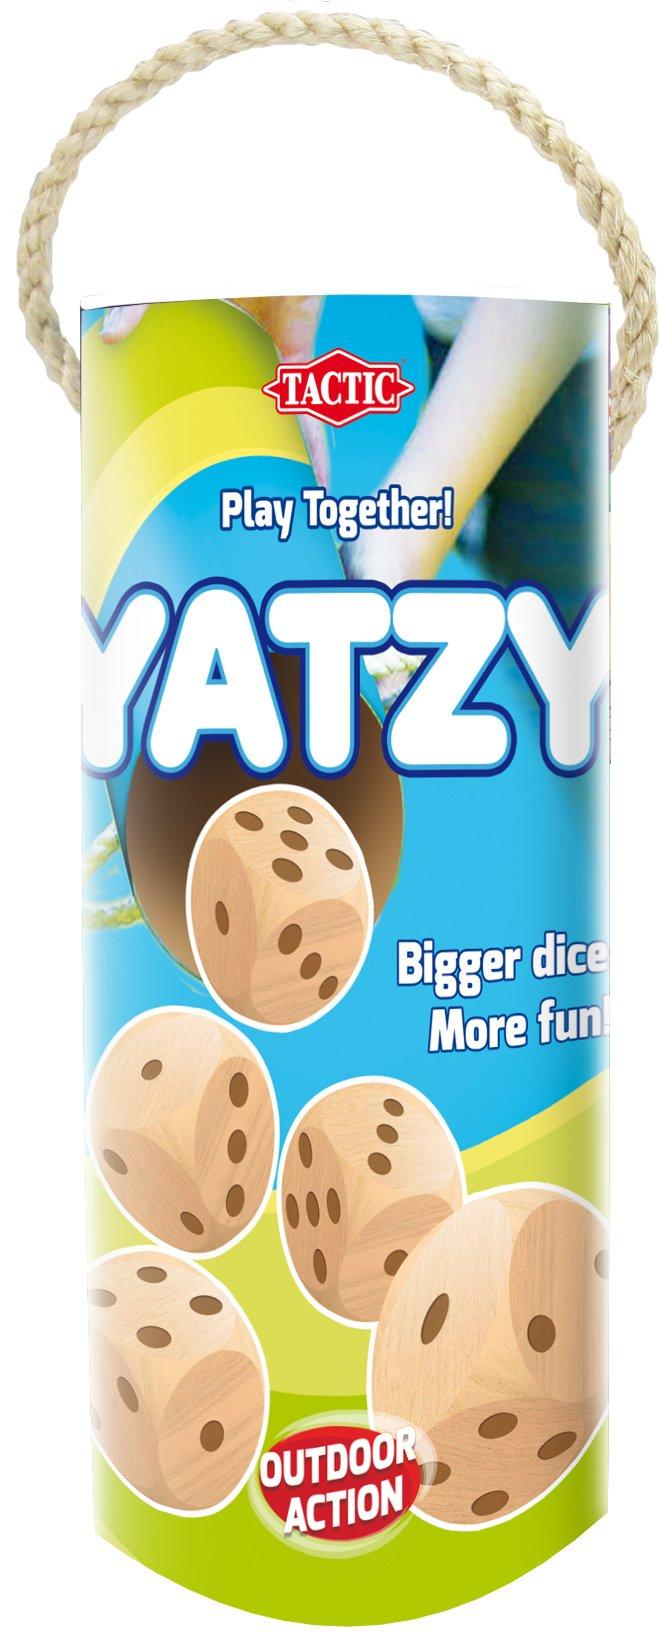 Tactic Garden Yatzy